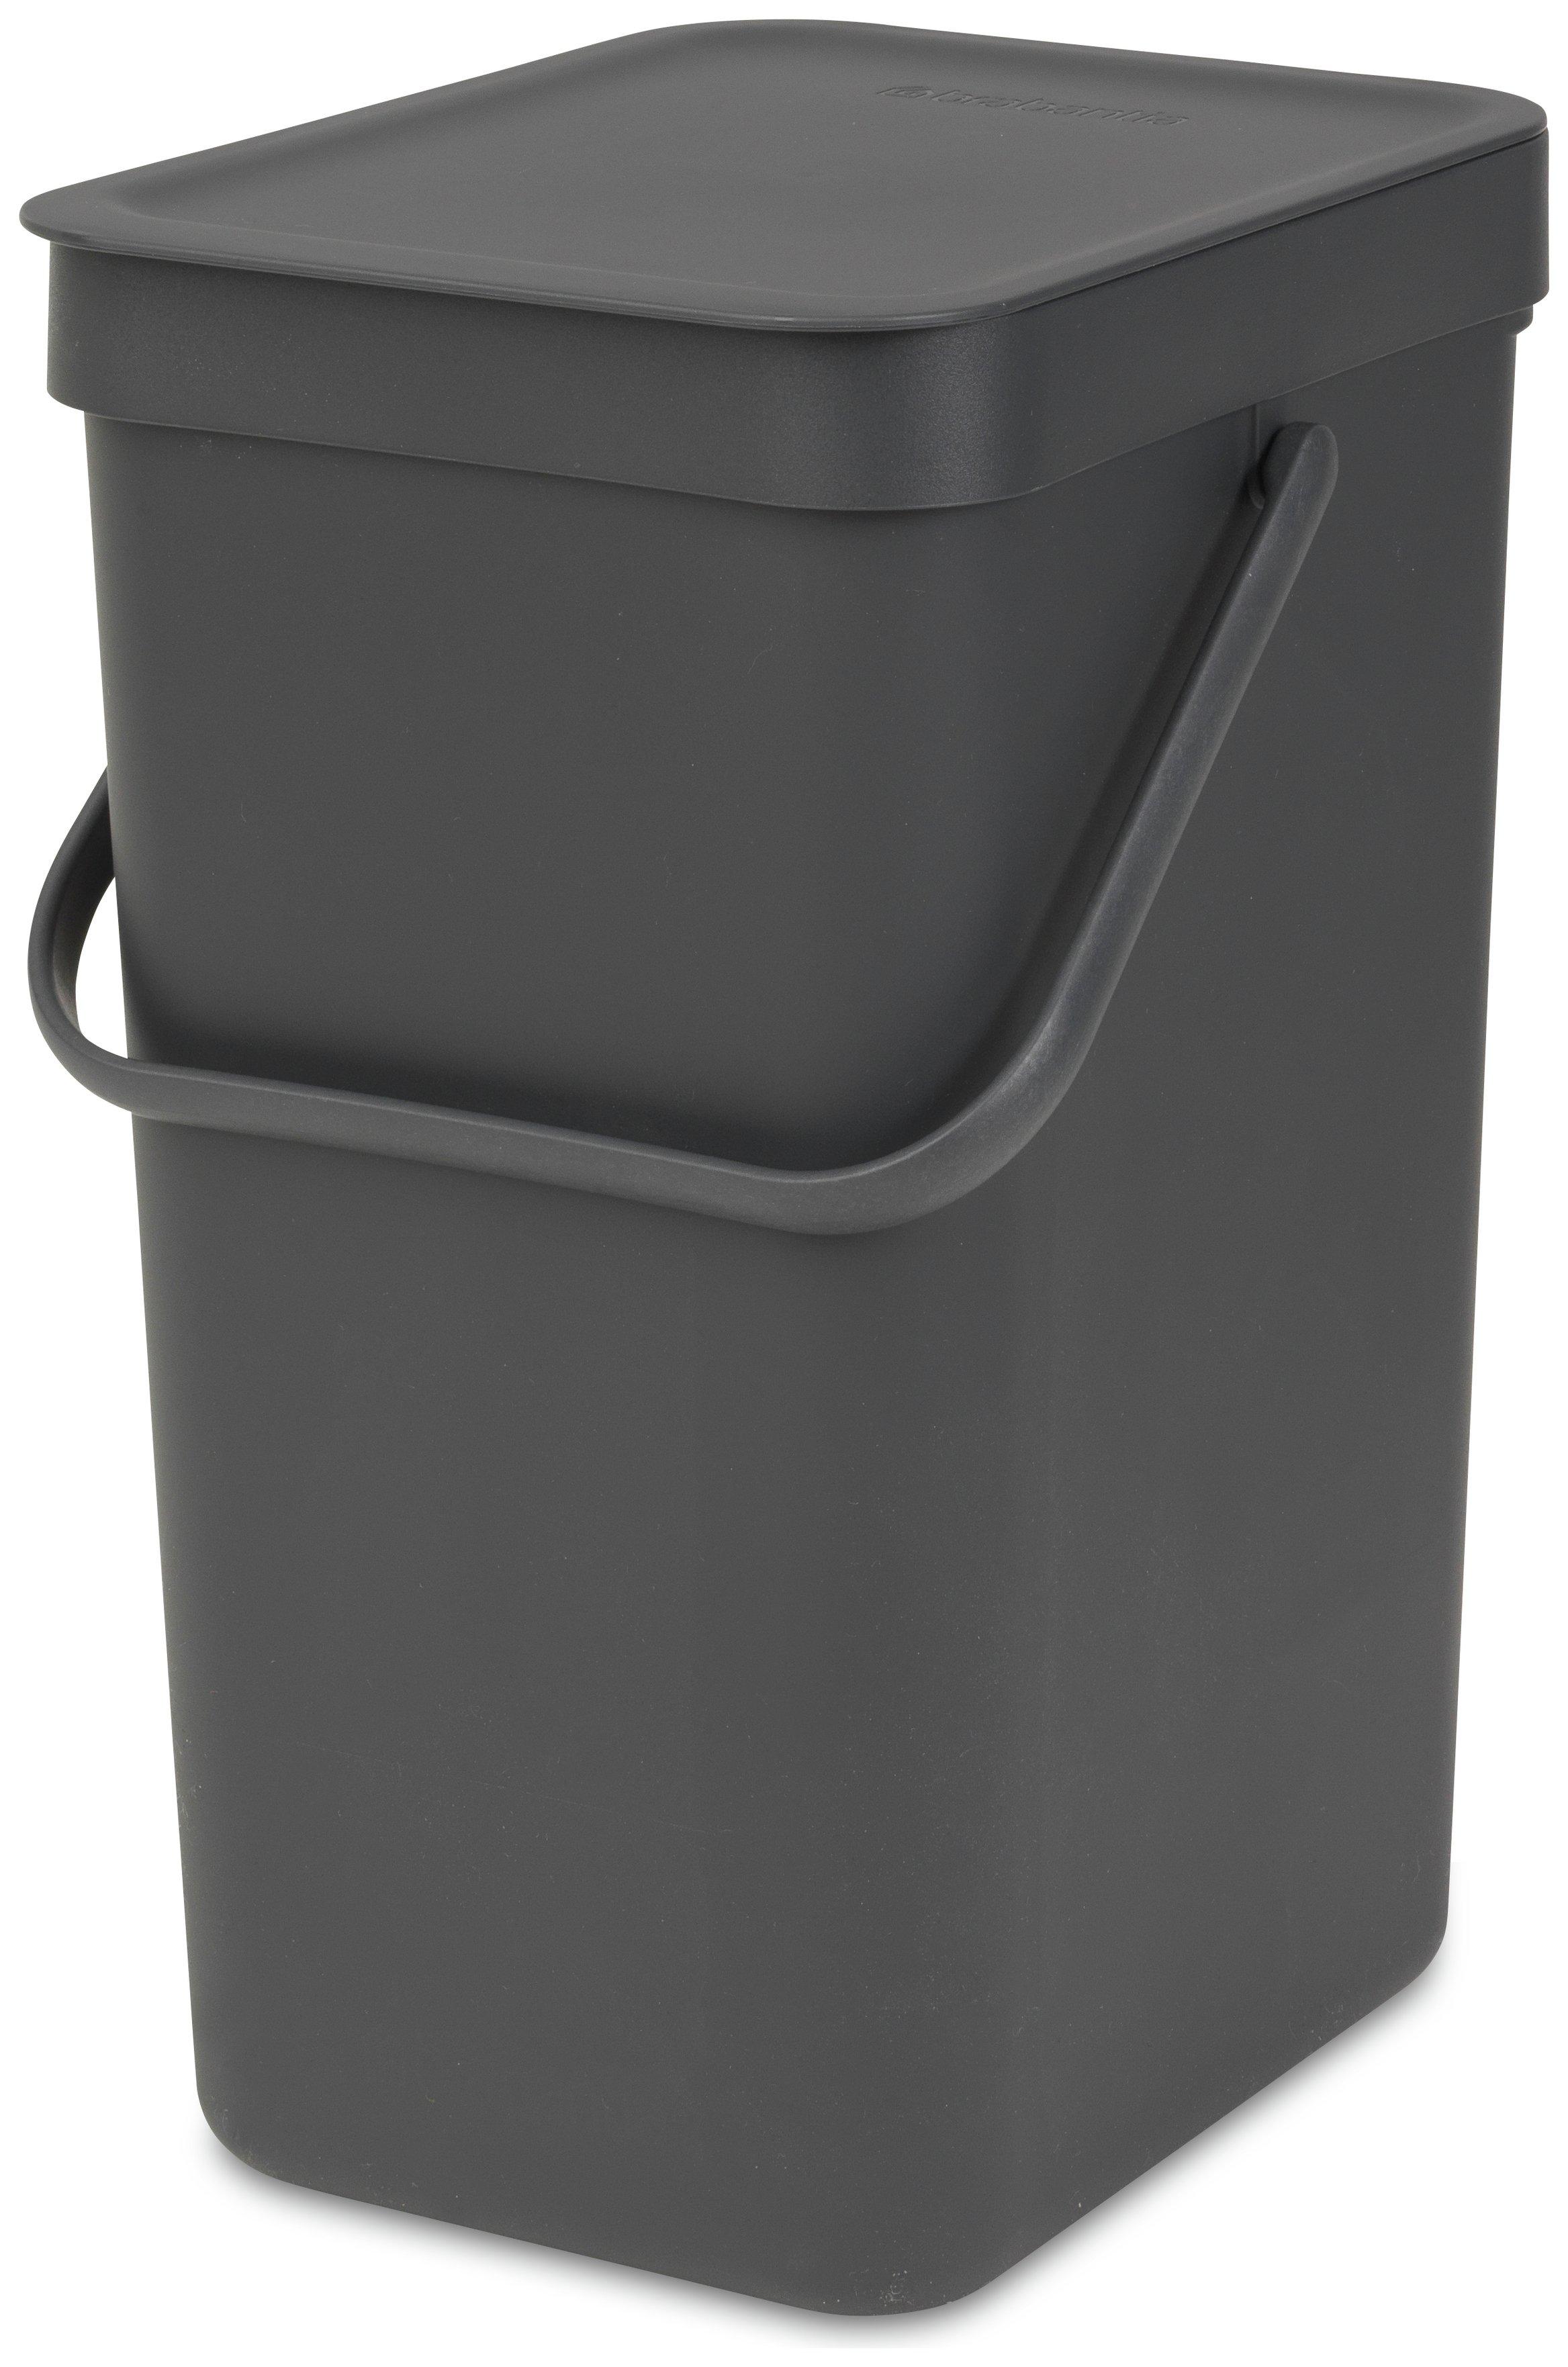 Image of Brabantia 12 Litre Sort and Go Waste Bin - Grey